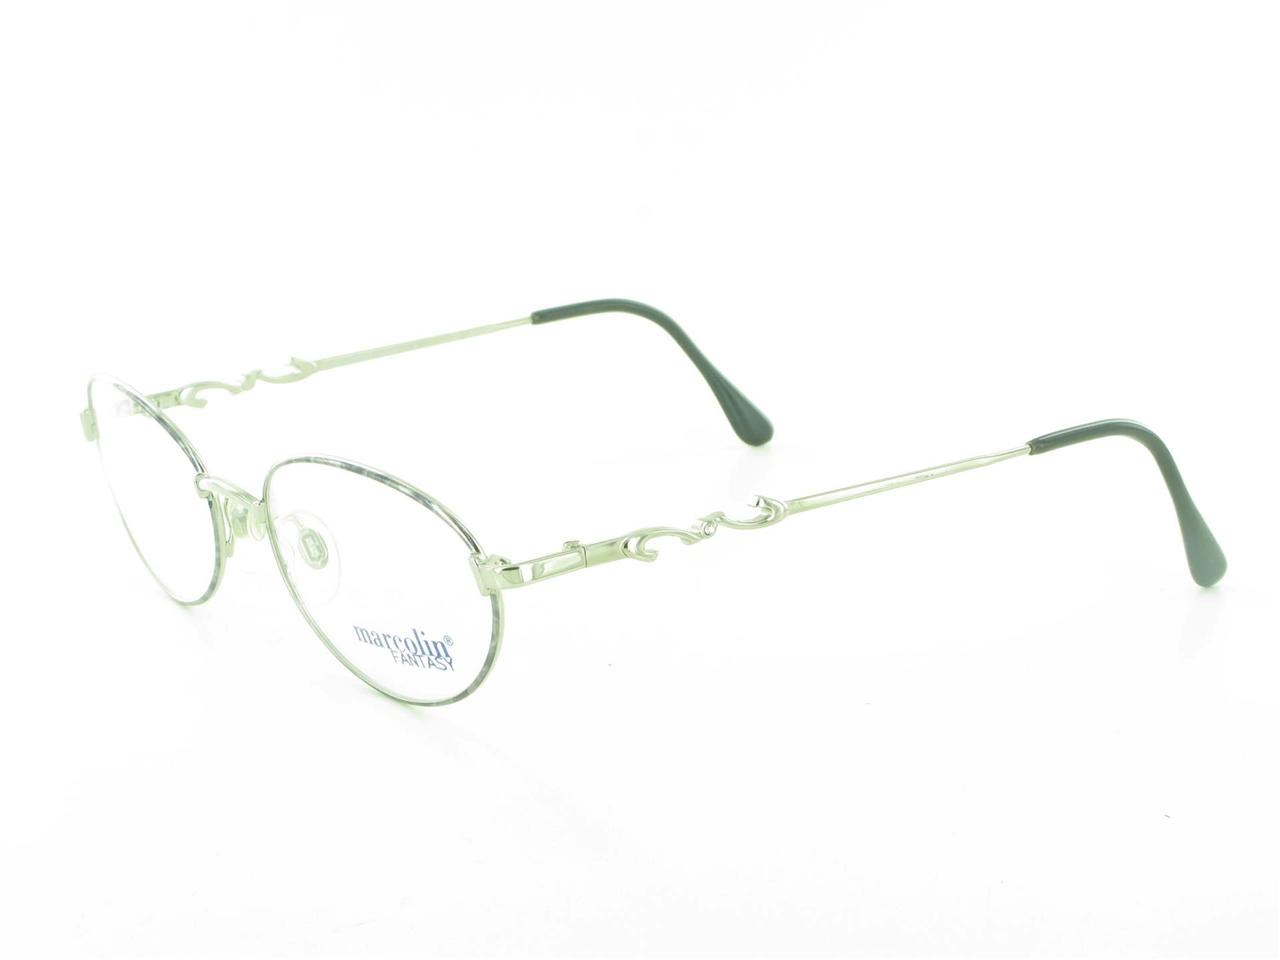 Ladies Eyeglass Frames Rhinestones : Womens Marcolin Round Oval Silver Gray Metal EYEGLASS ...